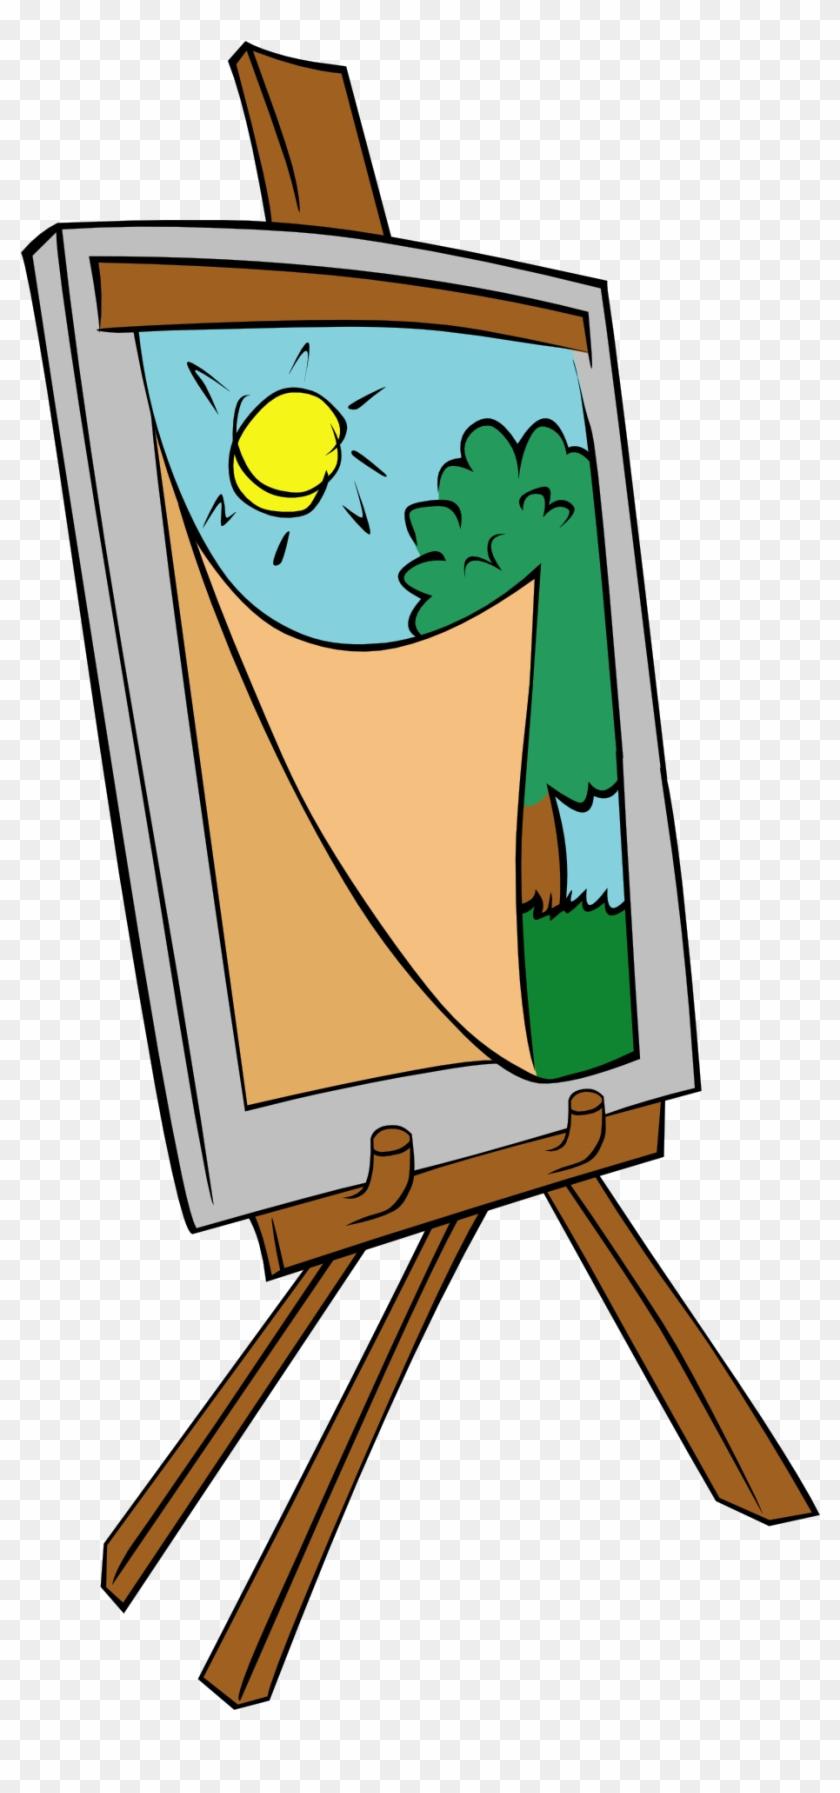 Painting Clipart Transparent - Painting Clipart Transparent Background #131722